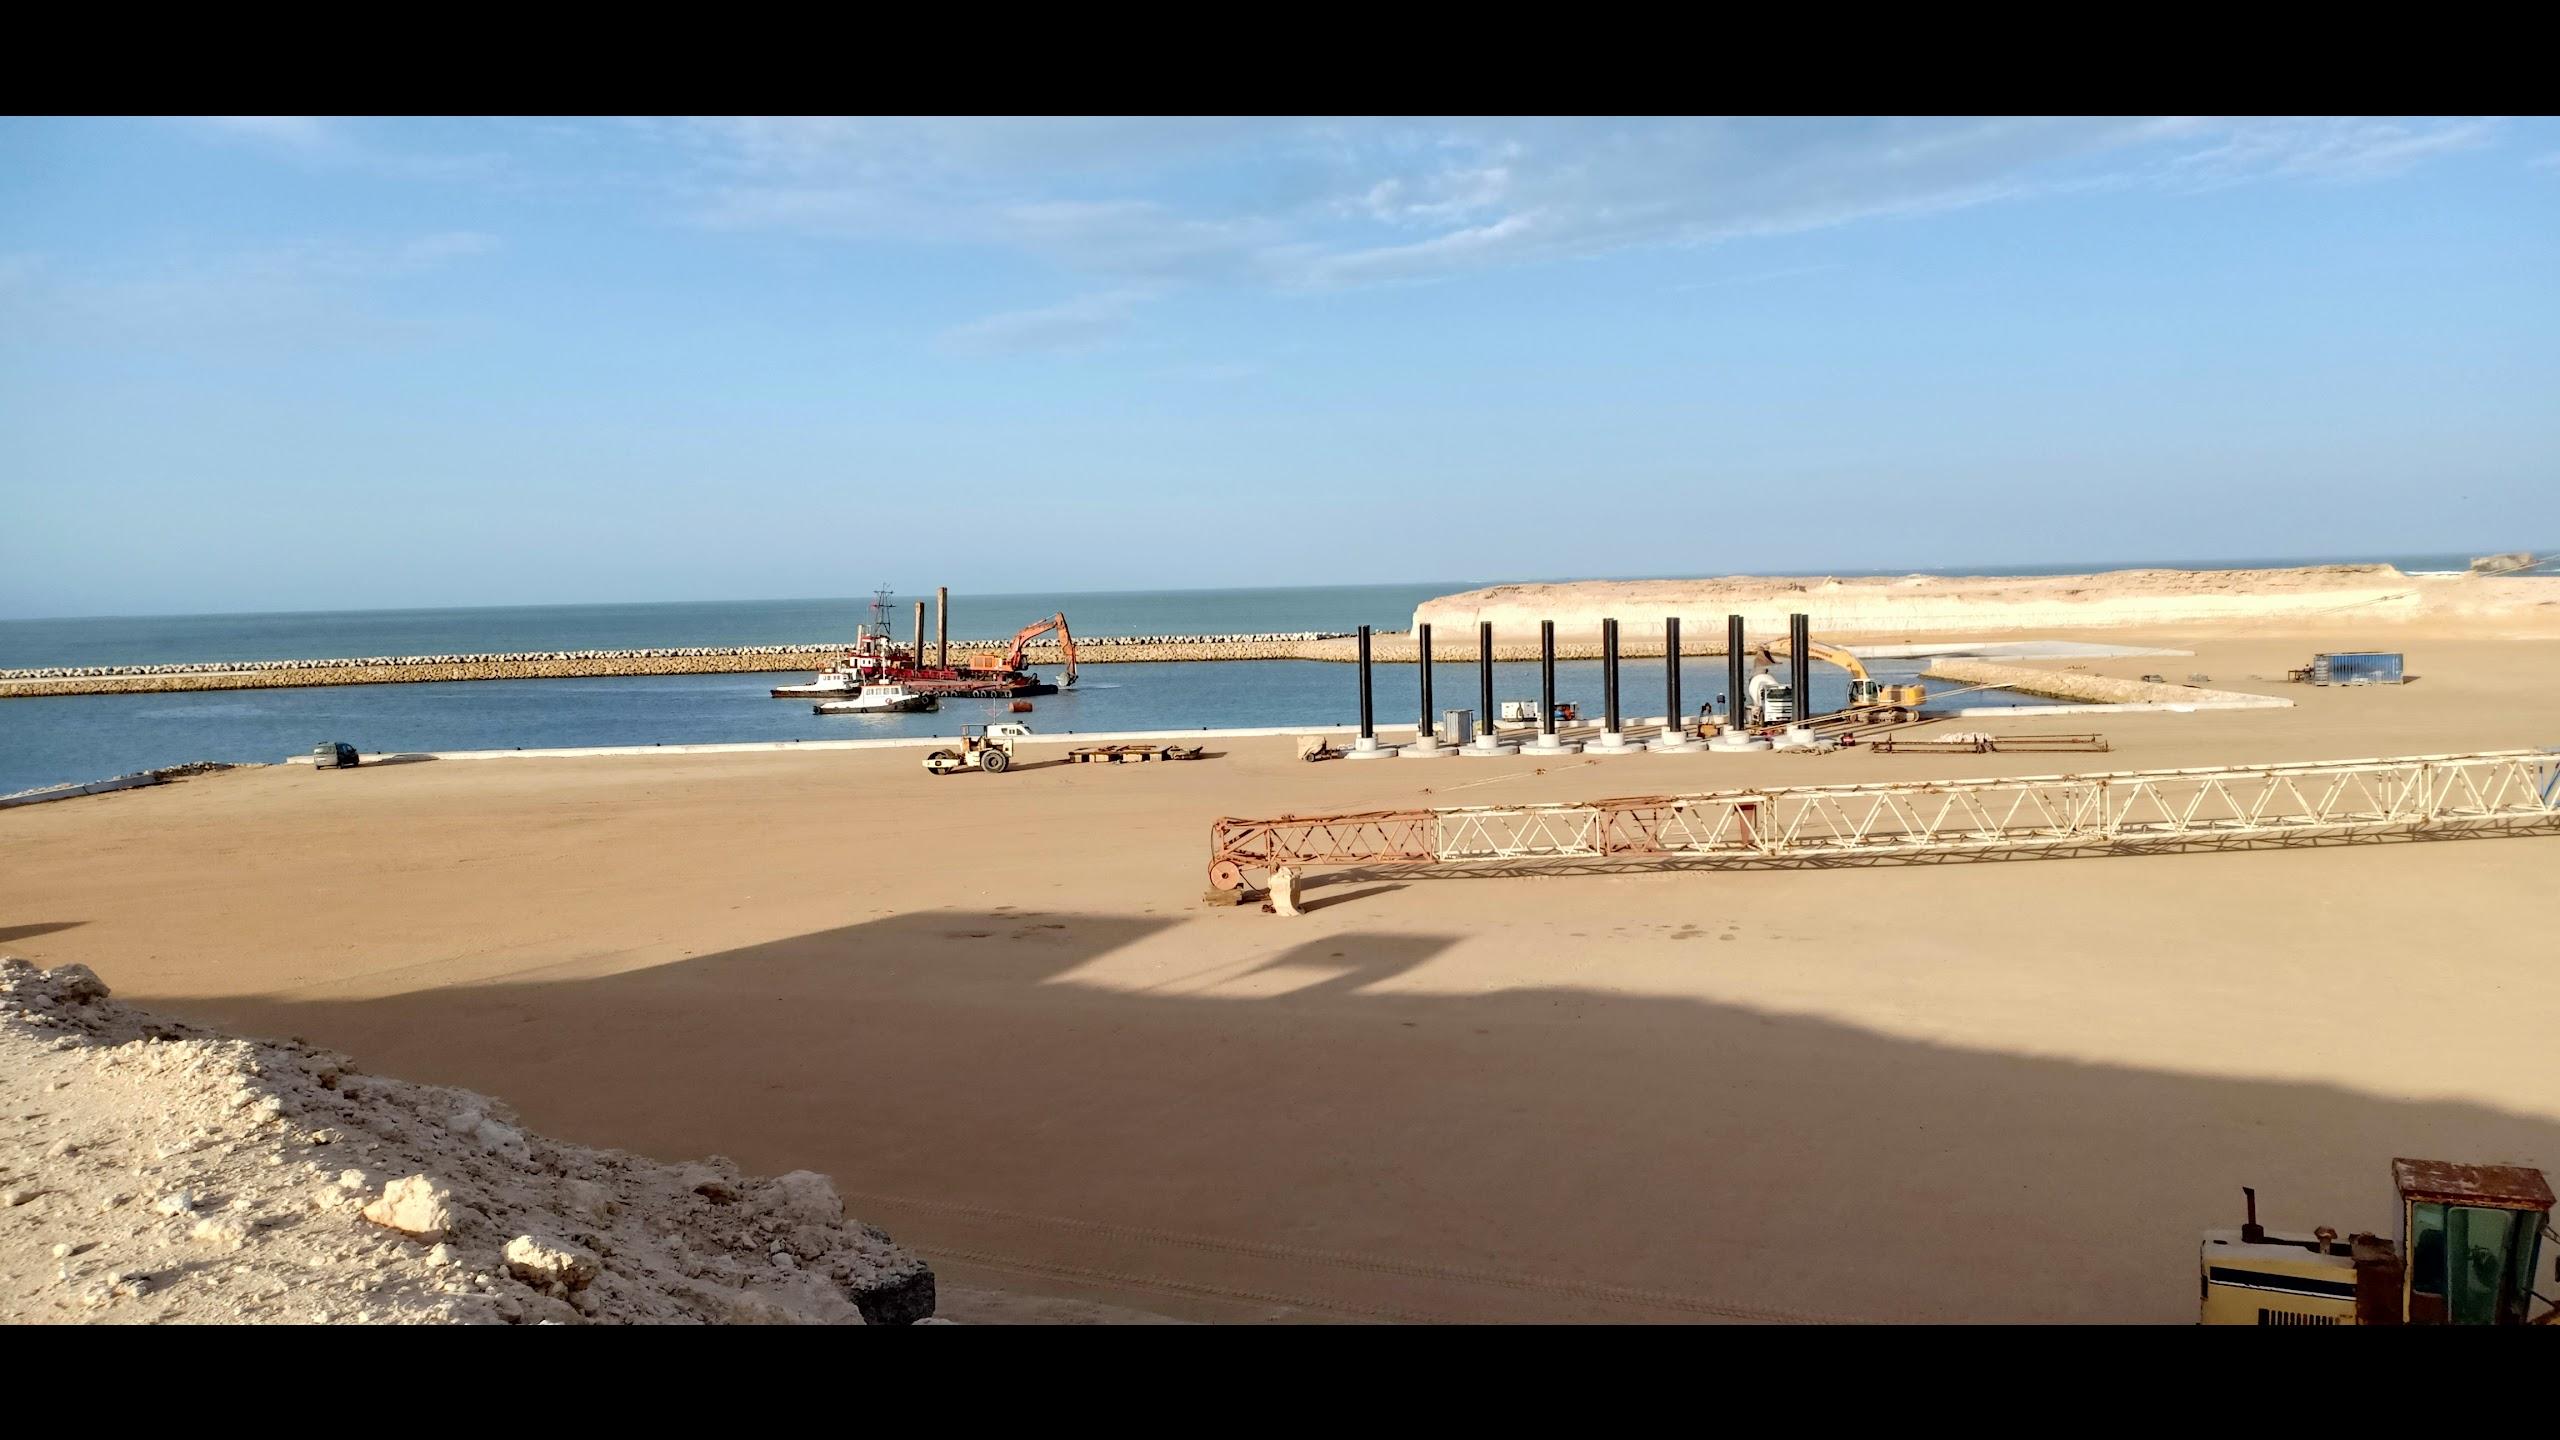 Actualités du Sahara Marocain - Page 15 AF1QipOjULMuIhb2INaJymPCwXs7ADzI0tm92VbWIkRp=w2560-h1440-pd